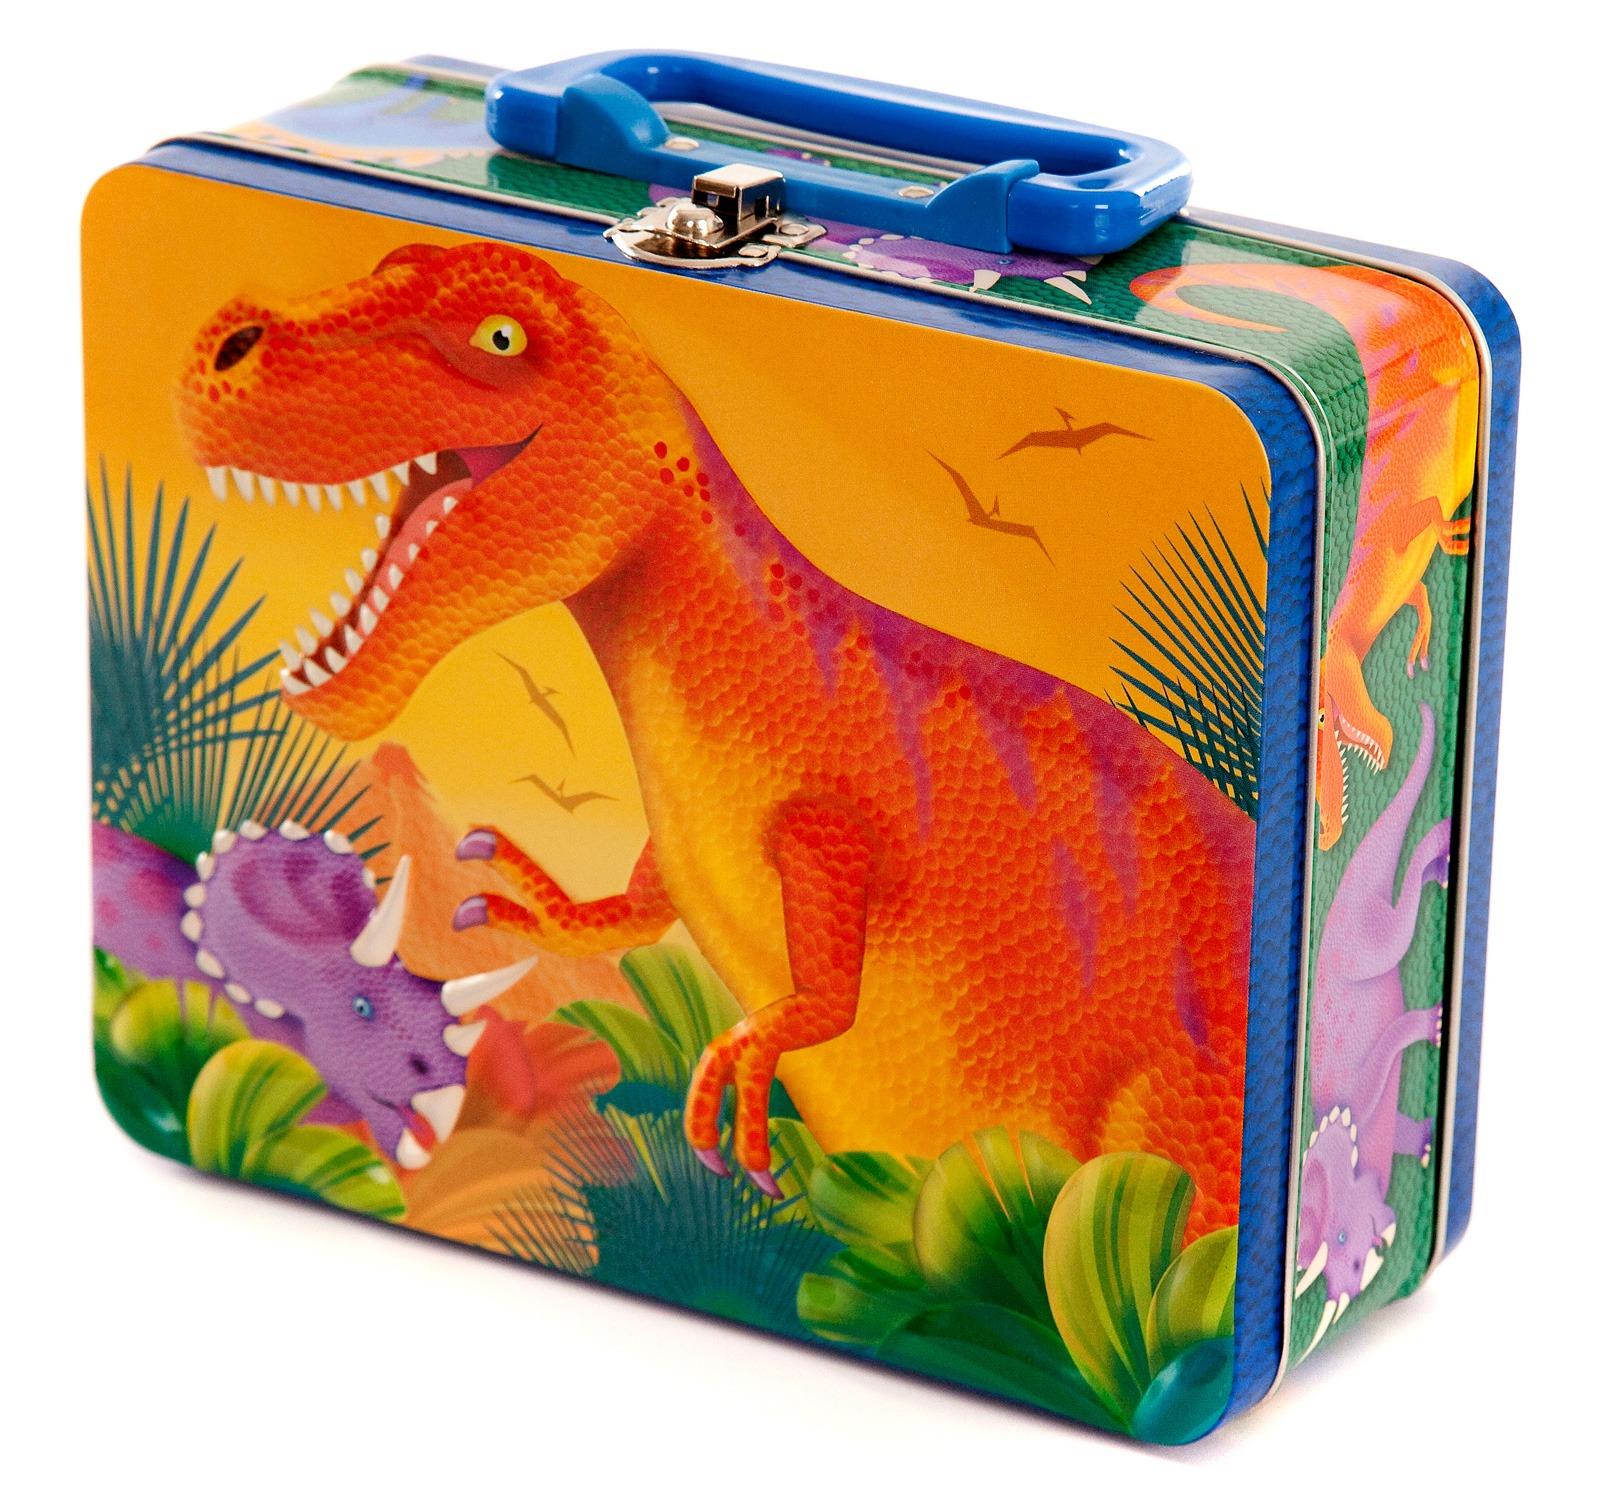 A dinosaur metal lunch box.